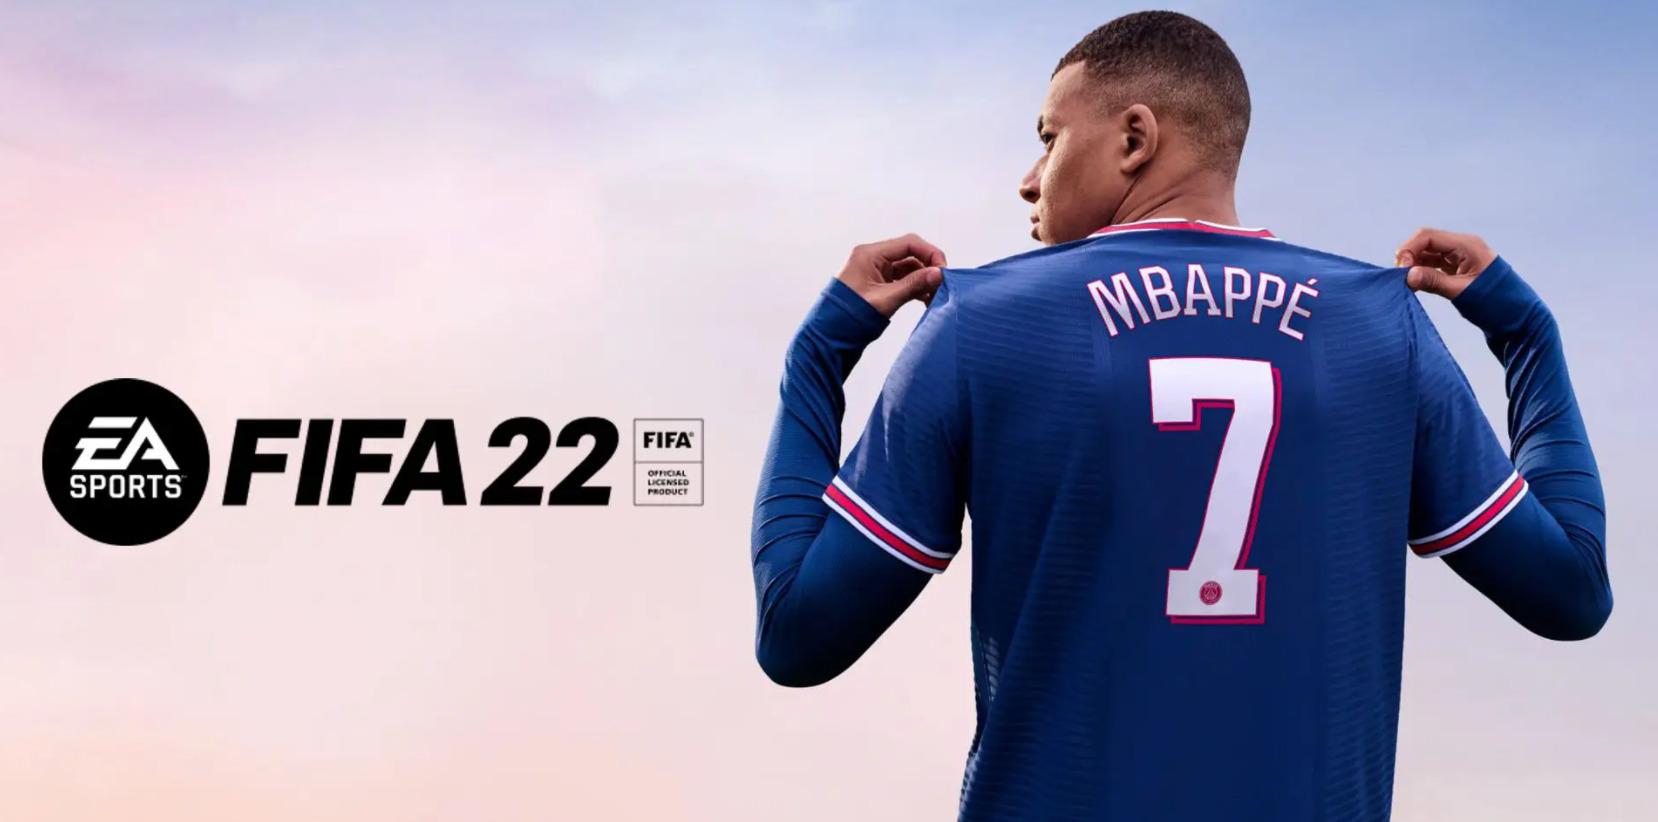 La FIFA podría ser rebautizada como 'EA Sports FC', GamesRD